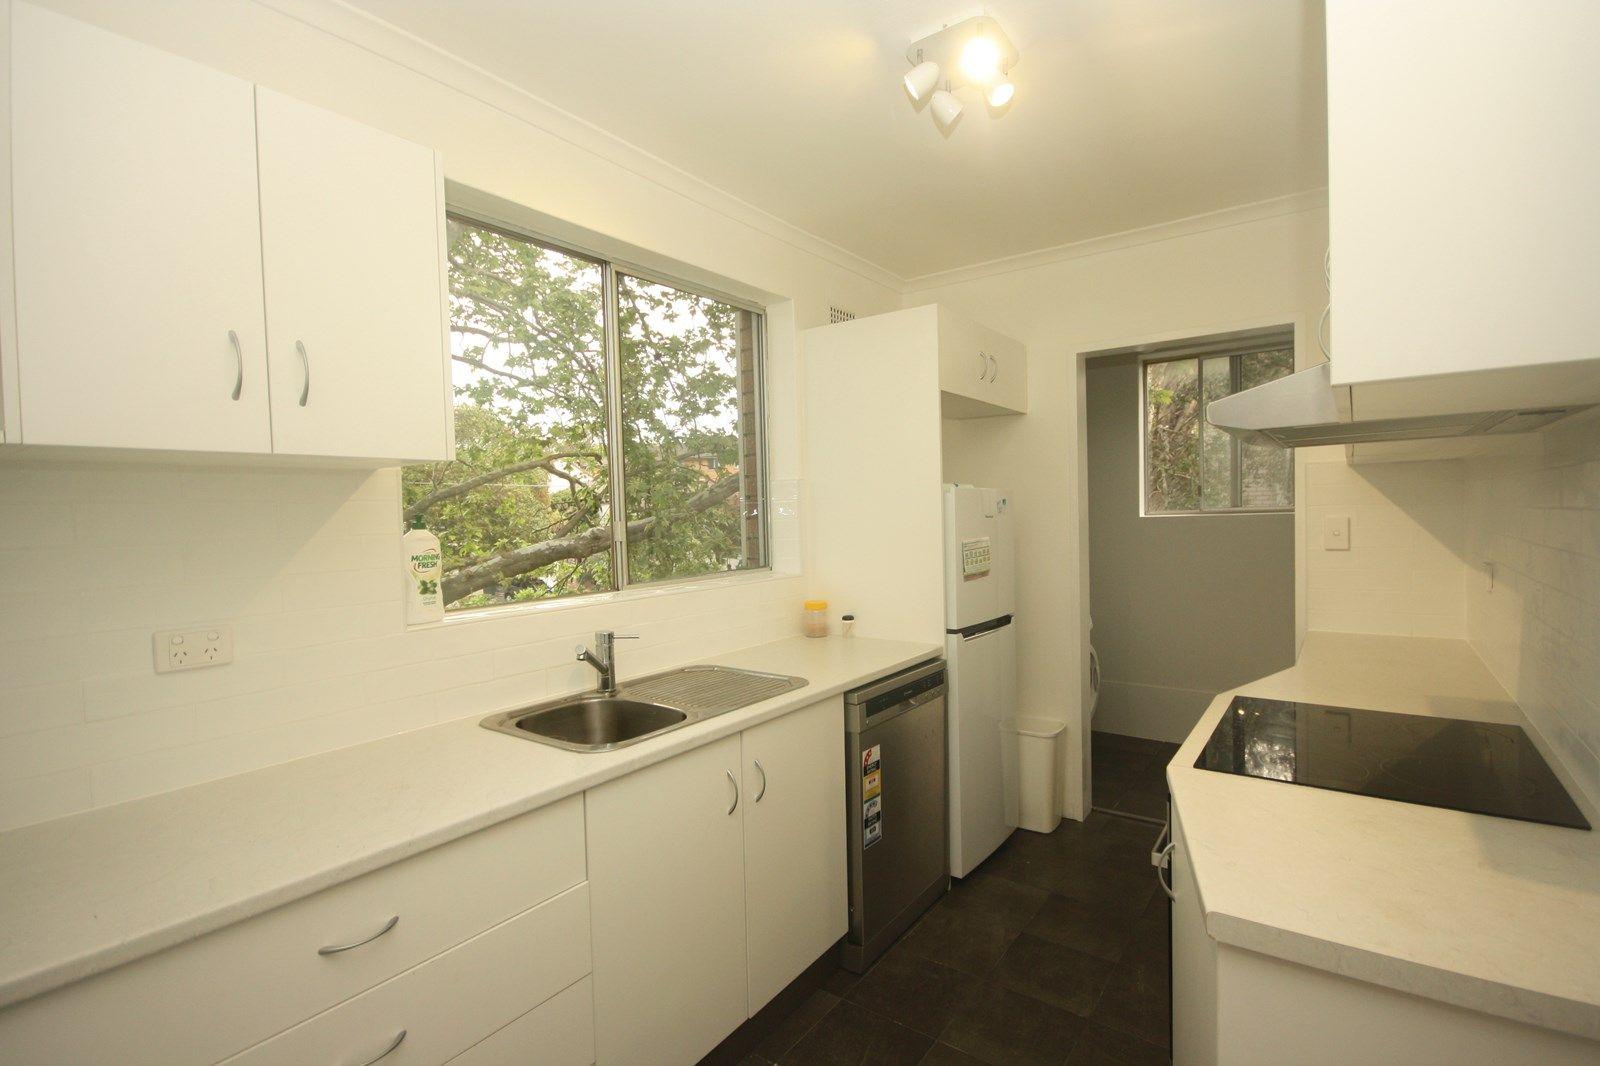 5/134 Hampden  Road, Abbotsford NSW 2046, Image 1